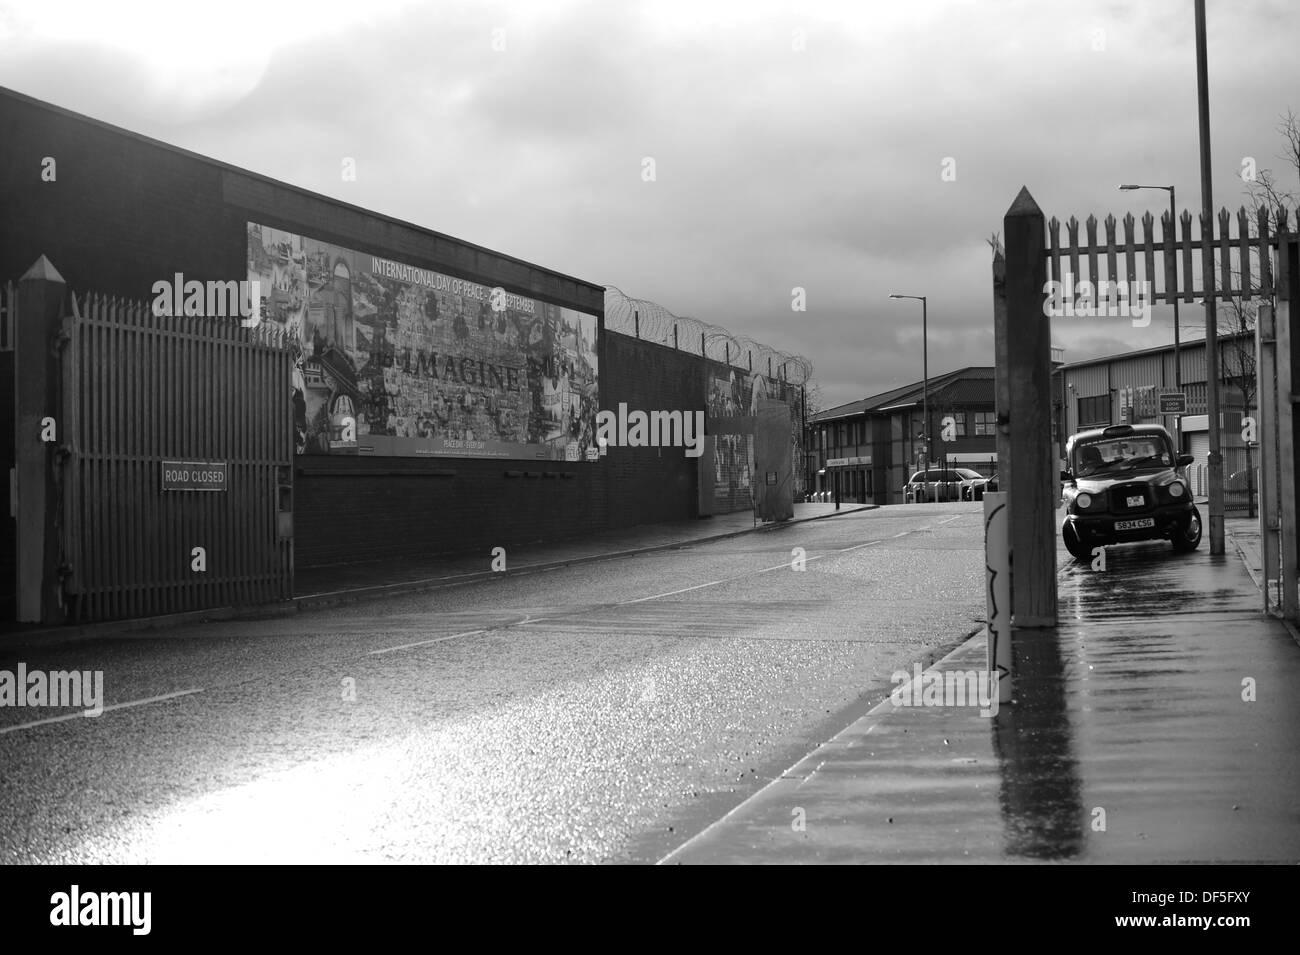 Shankill Road Library | Belfast | UPDATED June 2020 Top